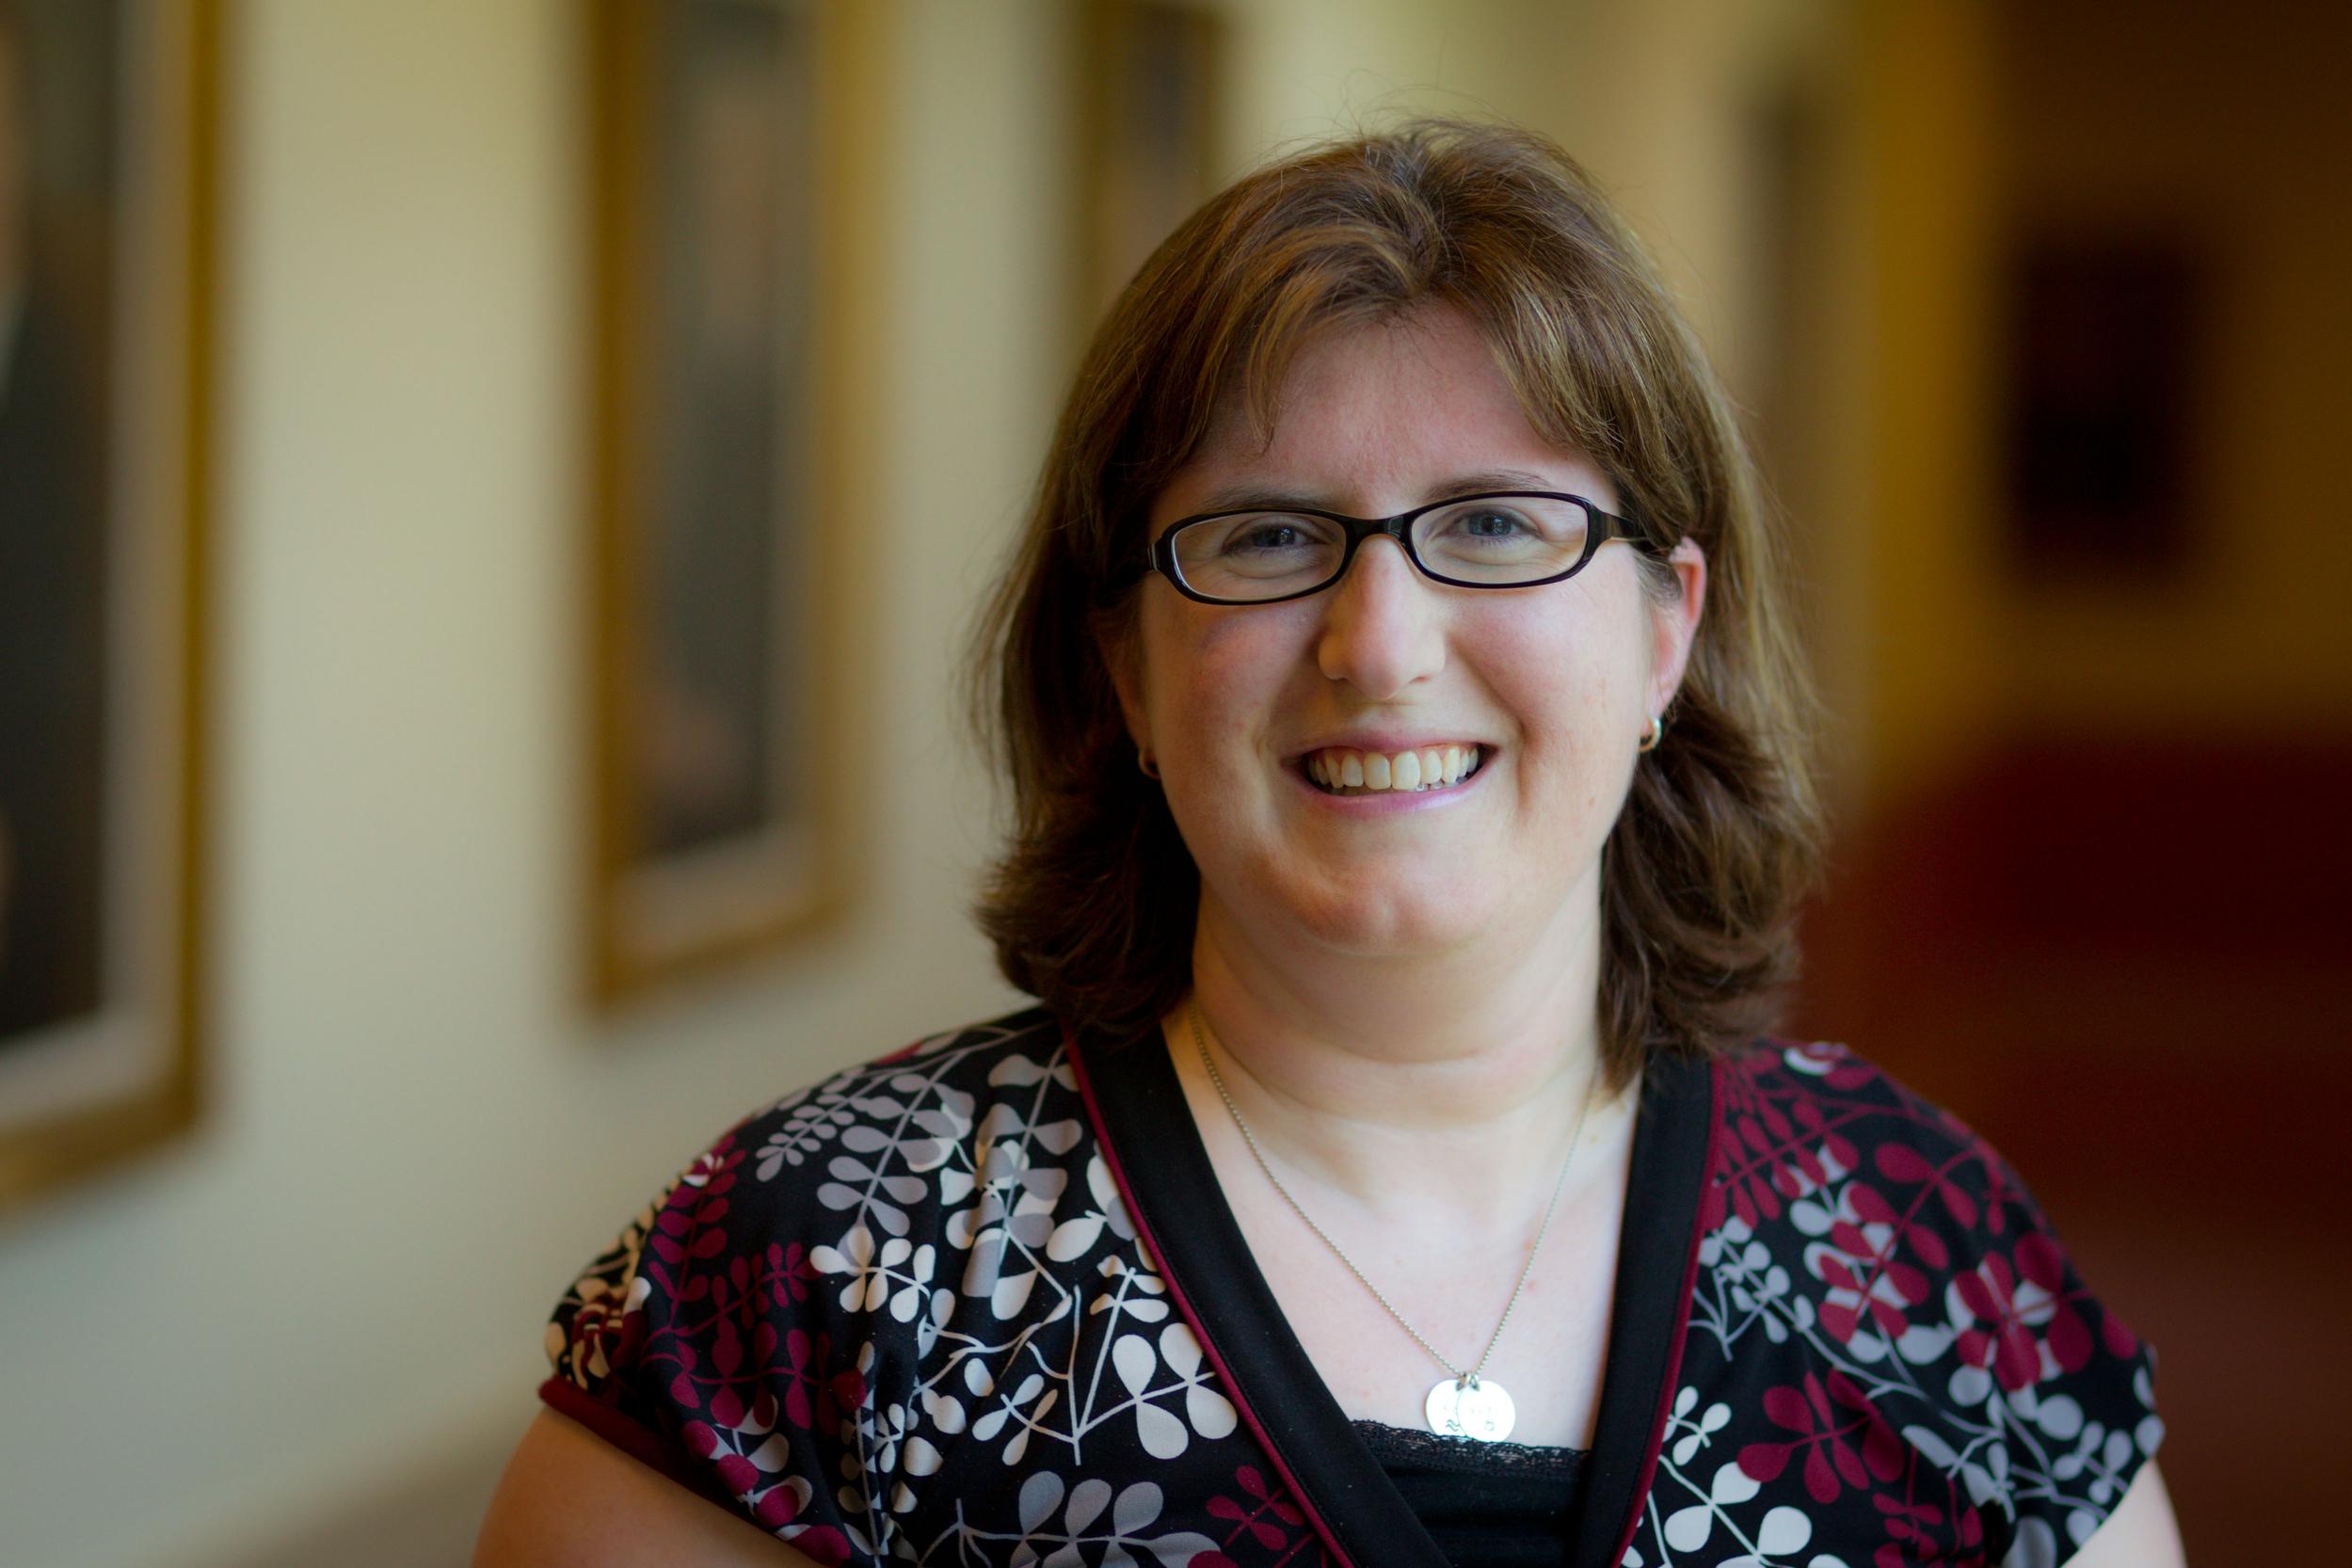 Wake Forest University School of Law professor Tanya Marsh